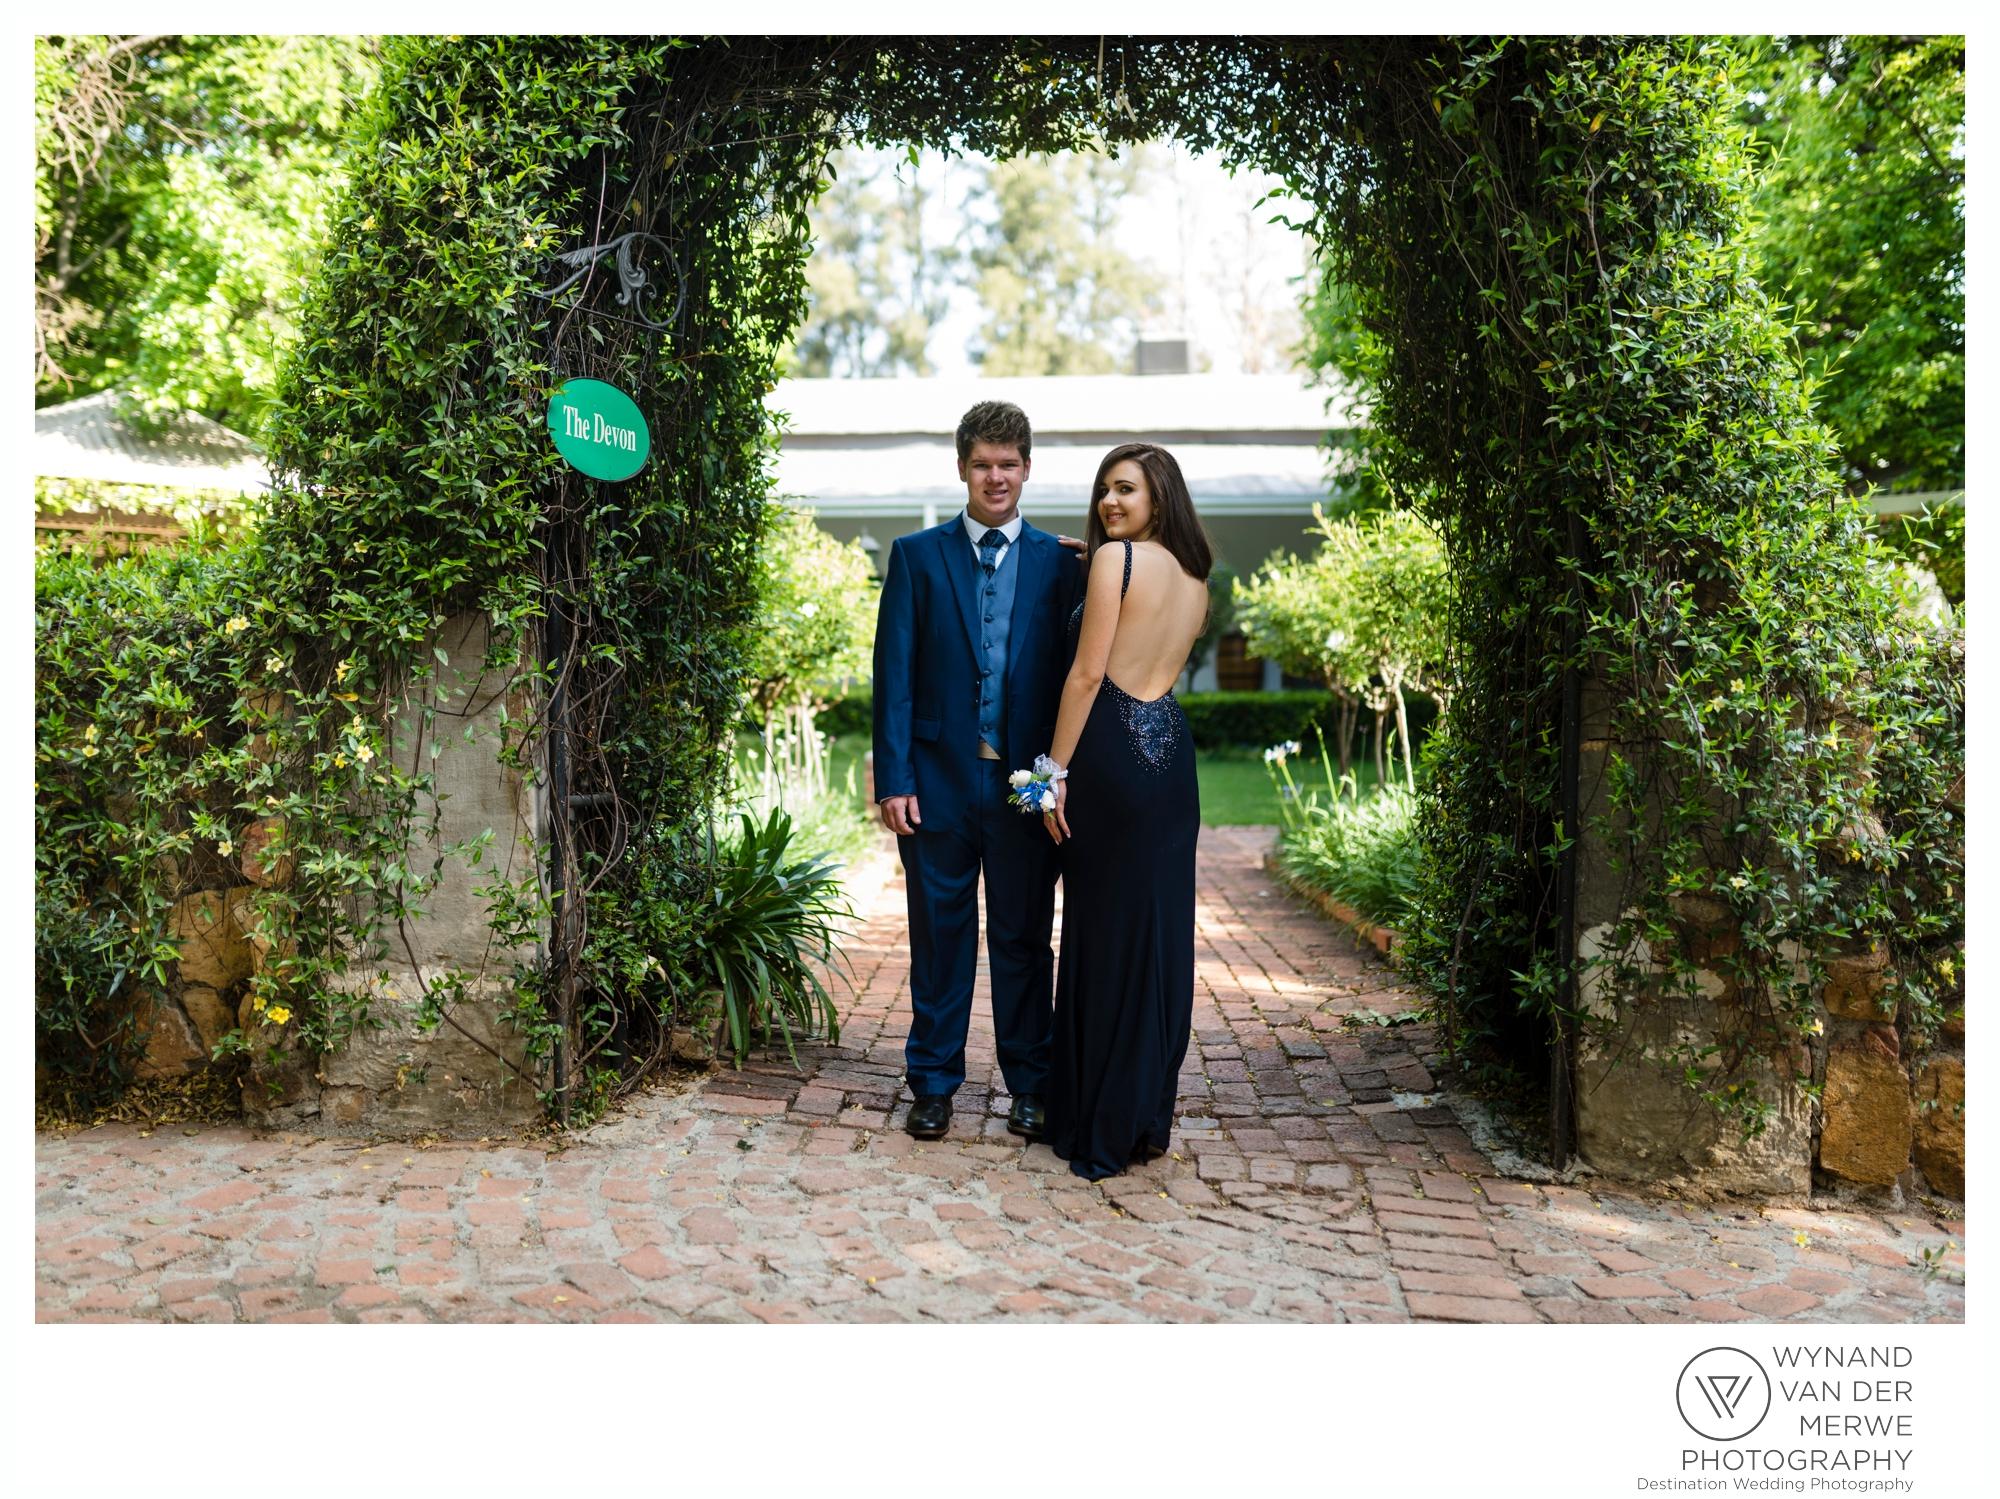 Kalinka & Dylan's Matric Farewell Hertford Country Hotel